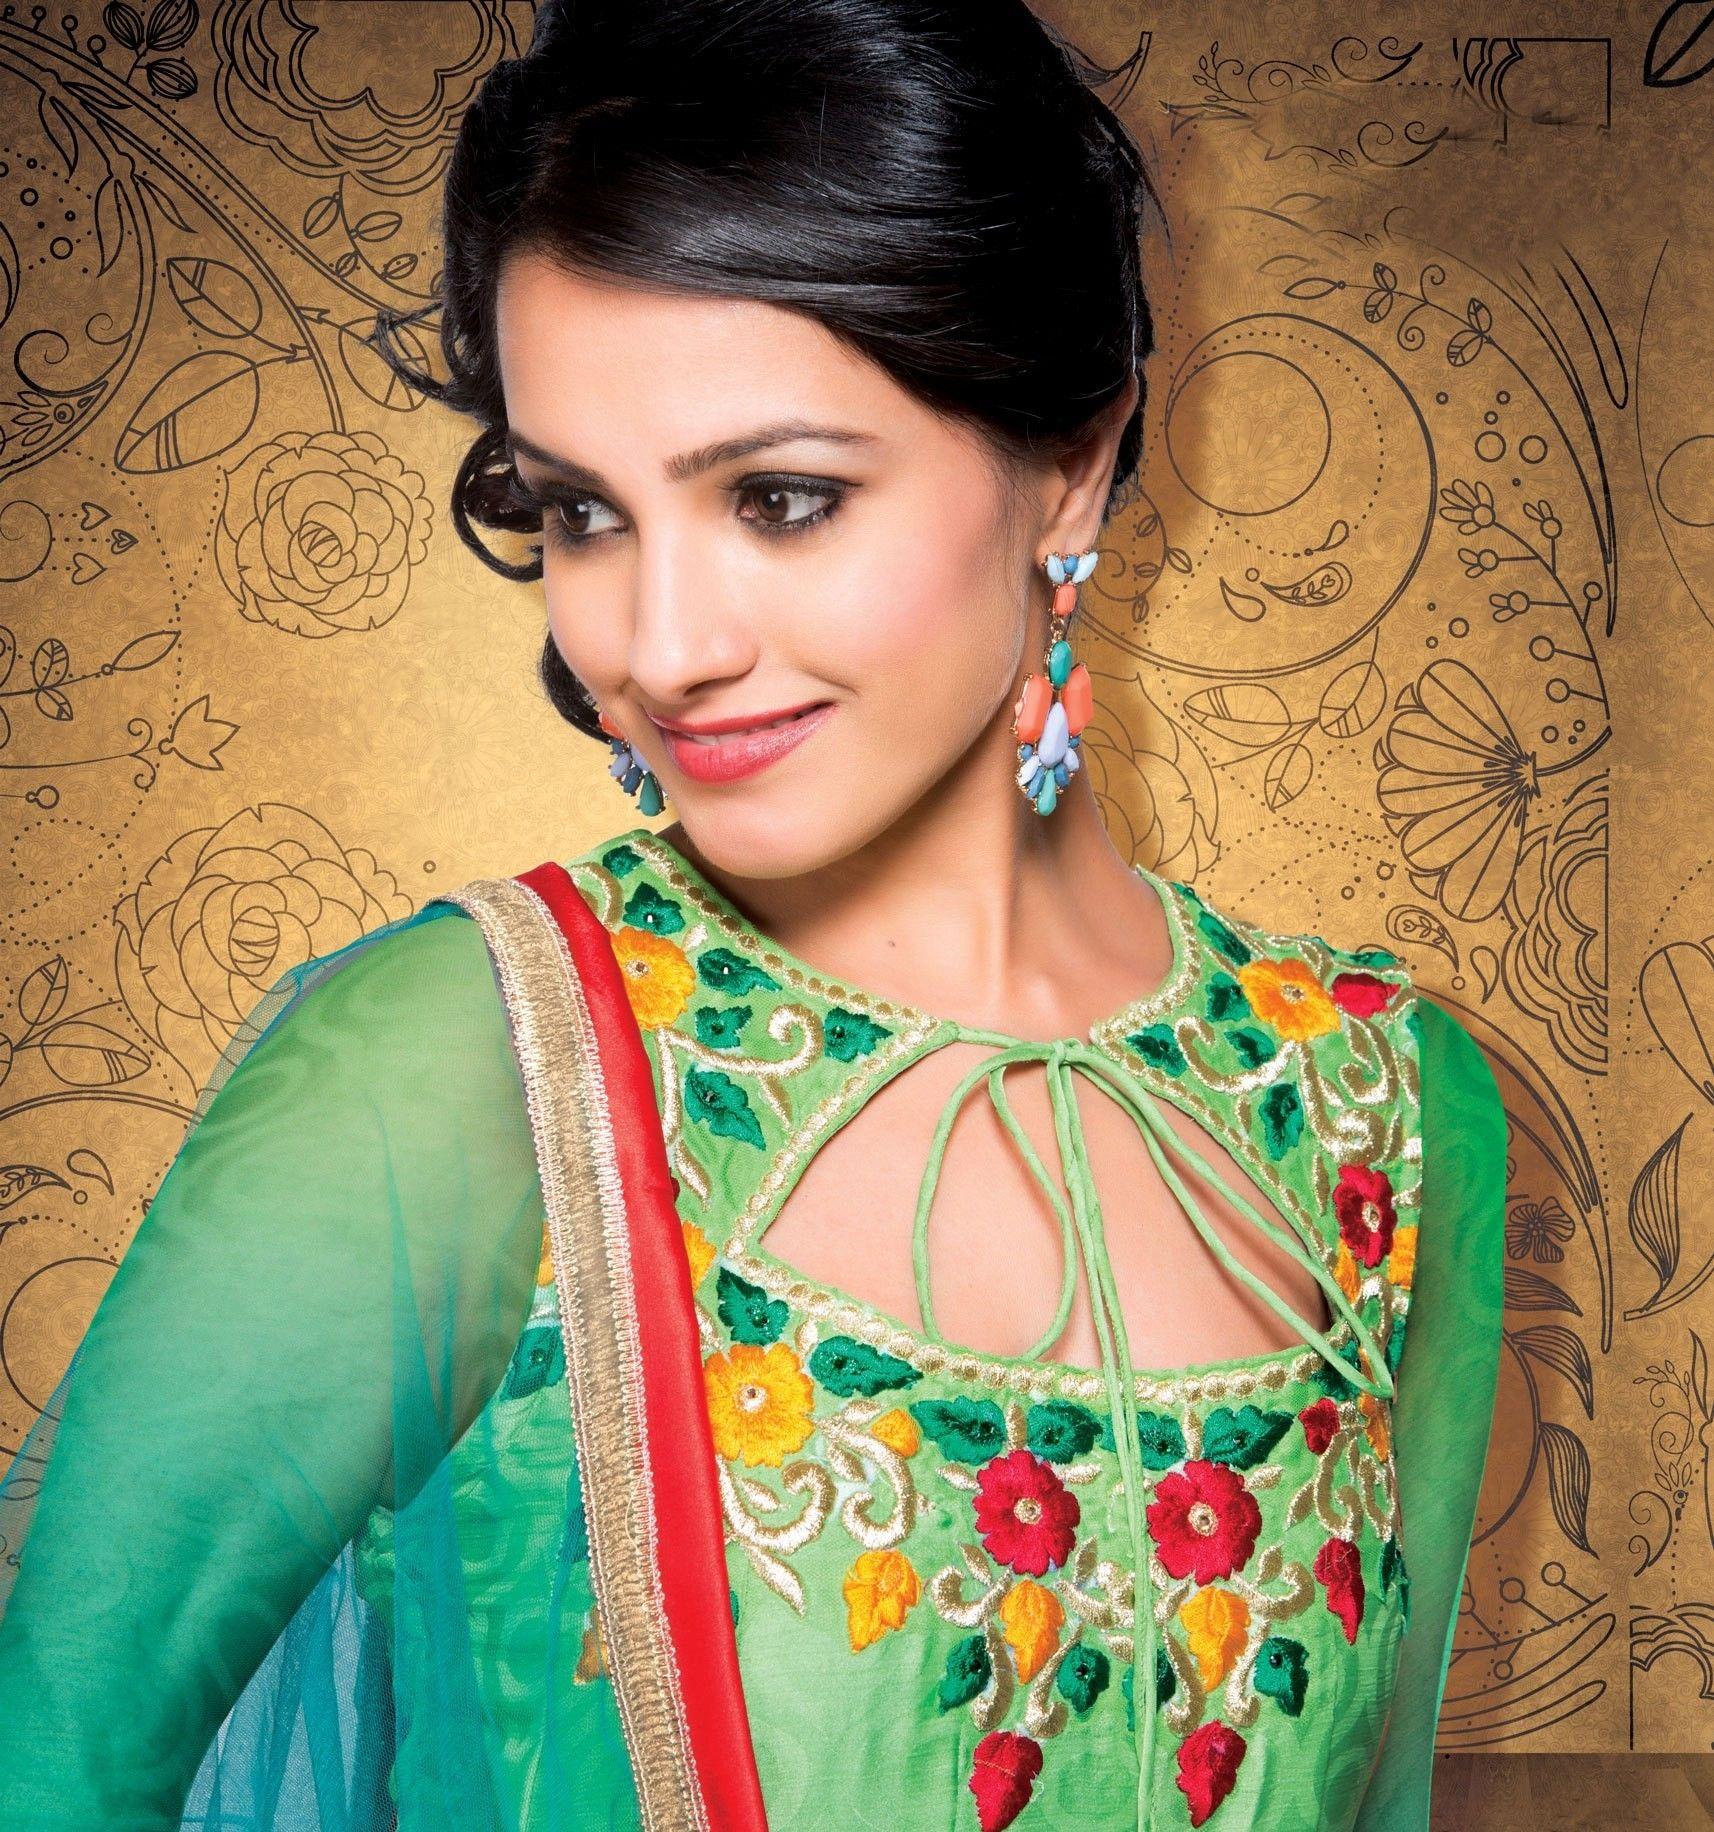 Bollywood Actress Anita Hassanandani Prettiest Actresses Bollywood Actress Aunty In Saree